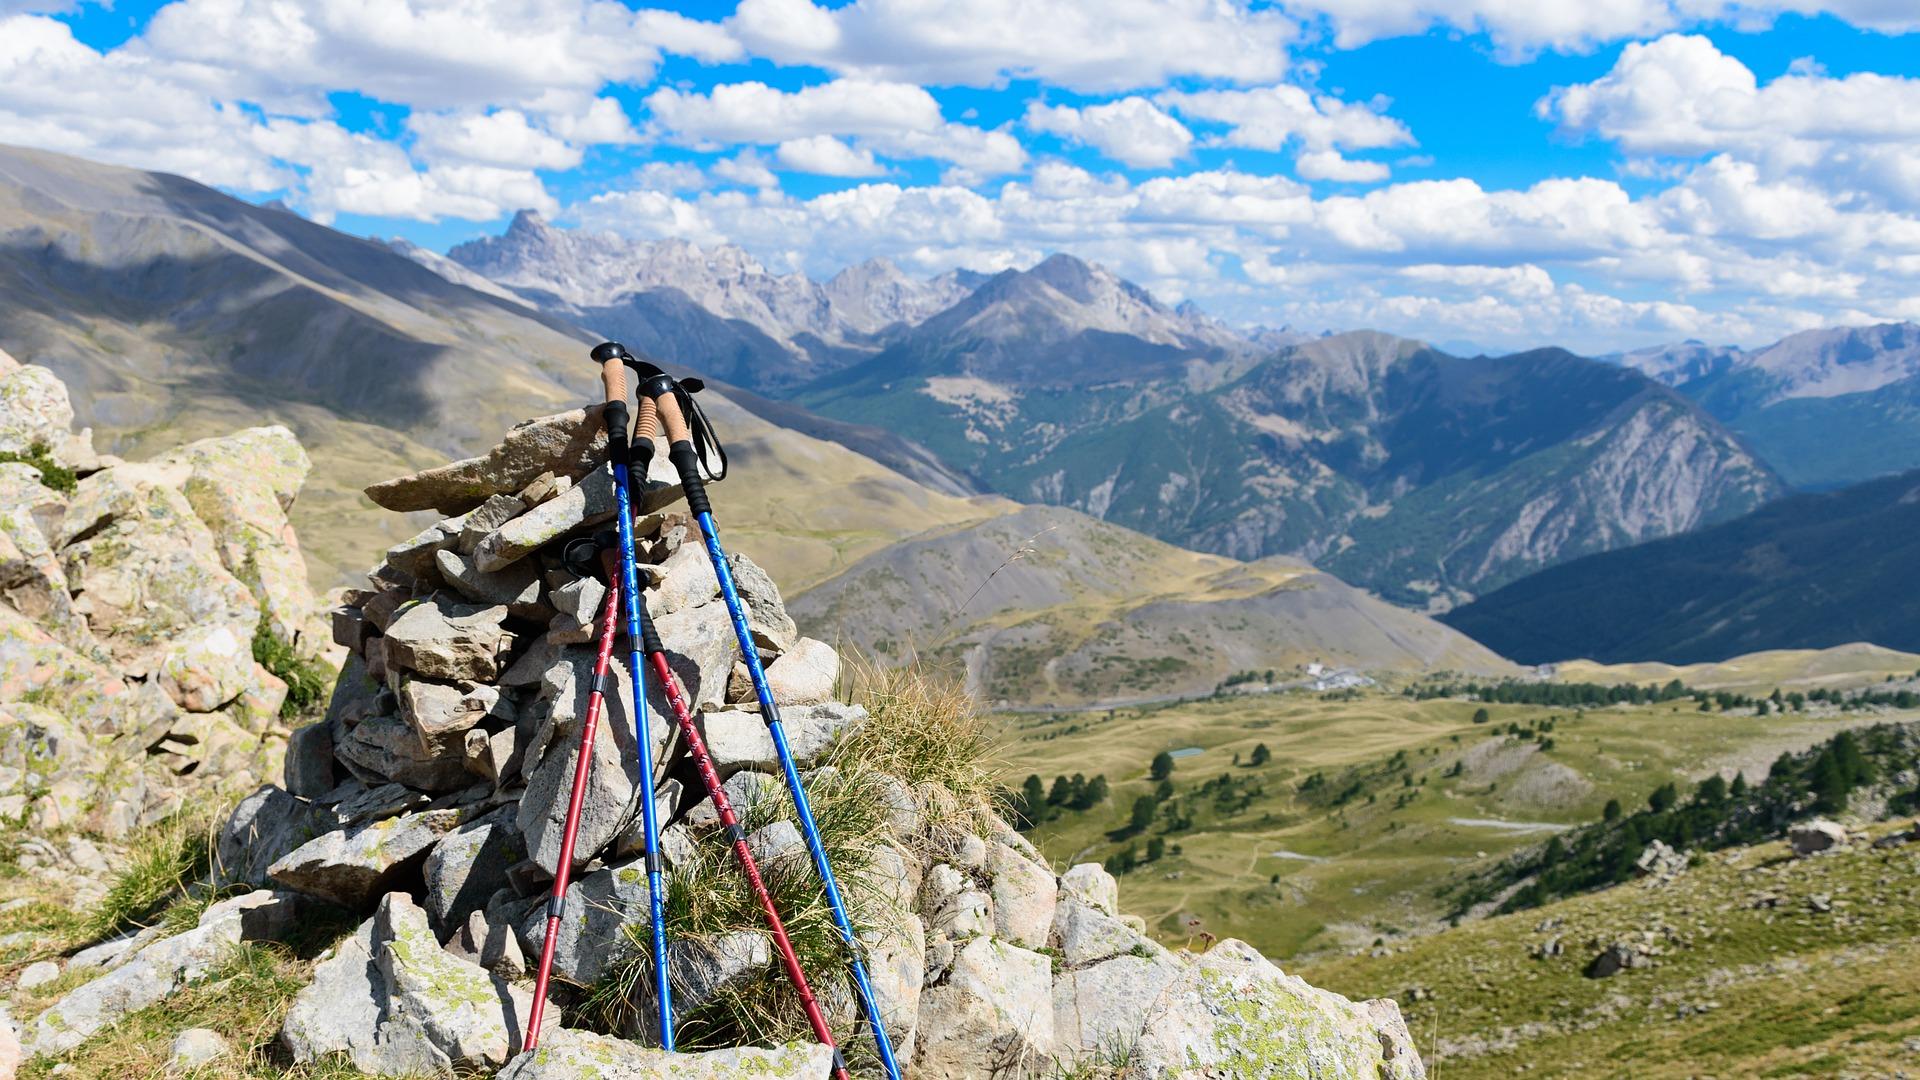 hiking pole mountain trekking pixabay